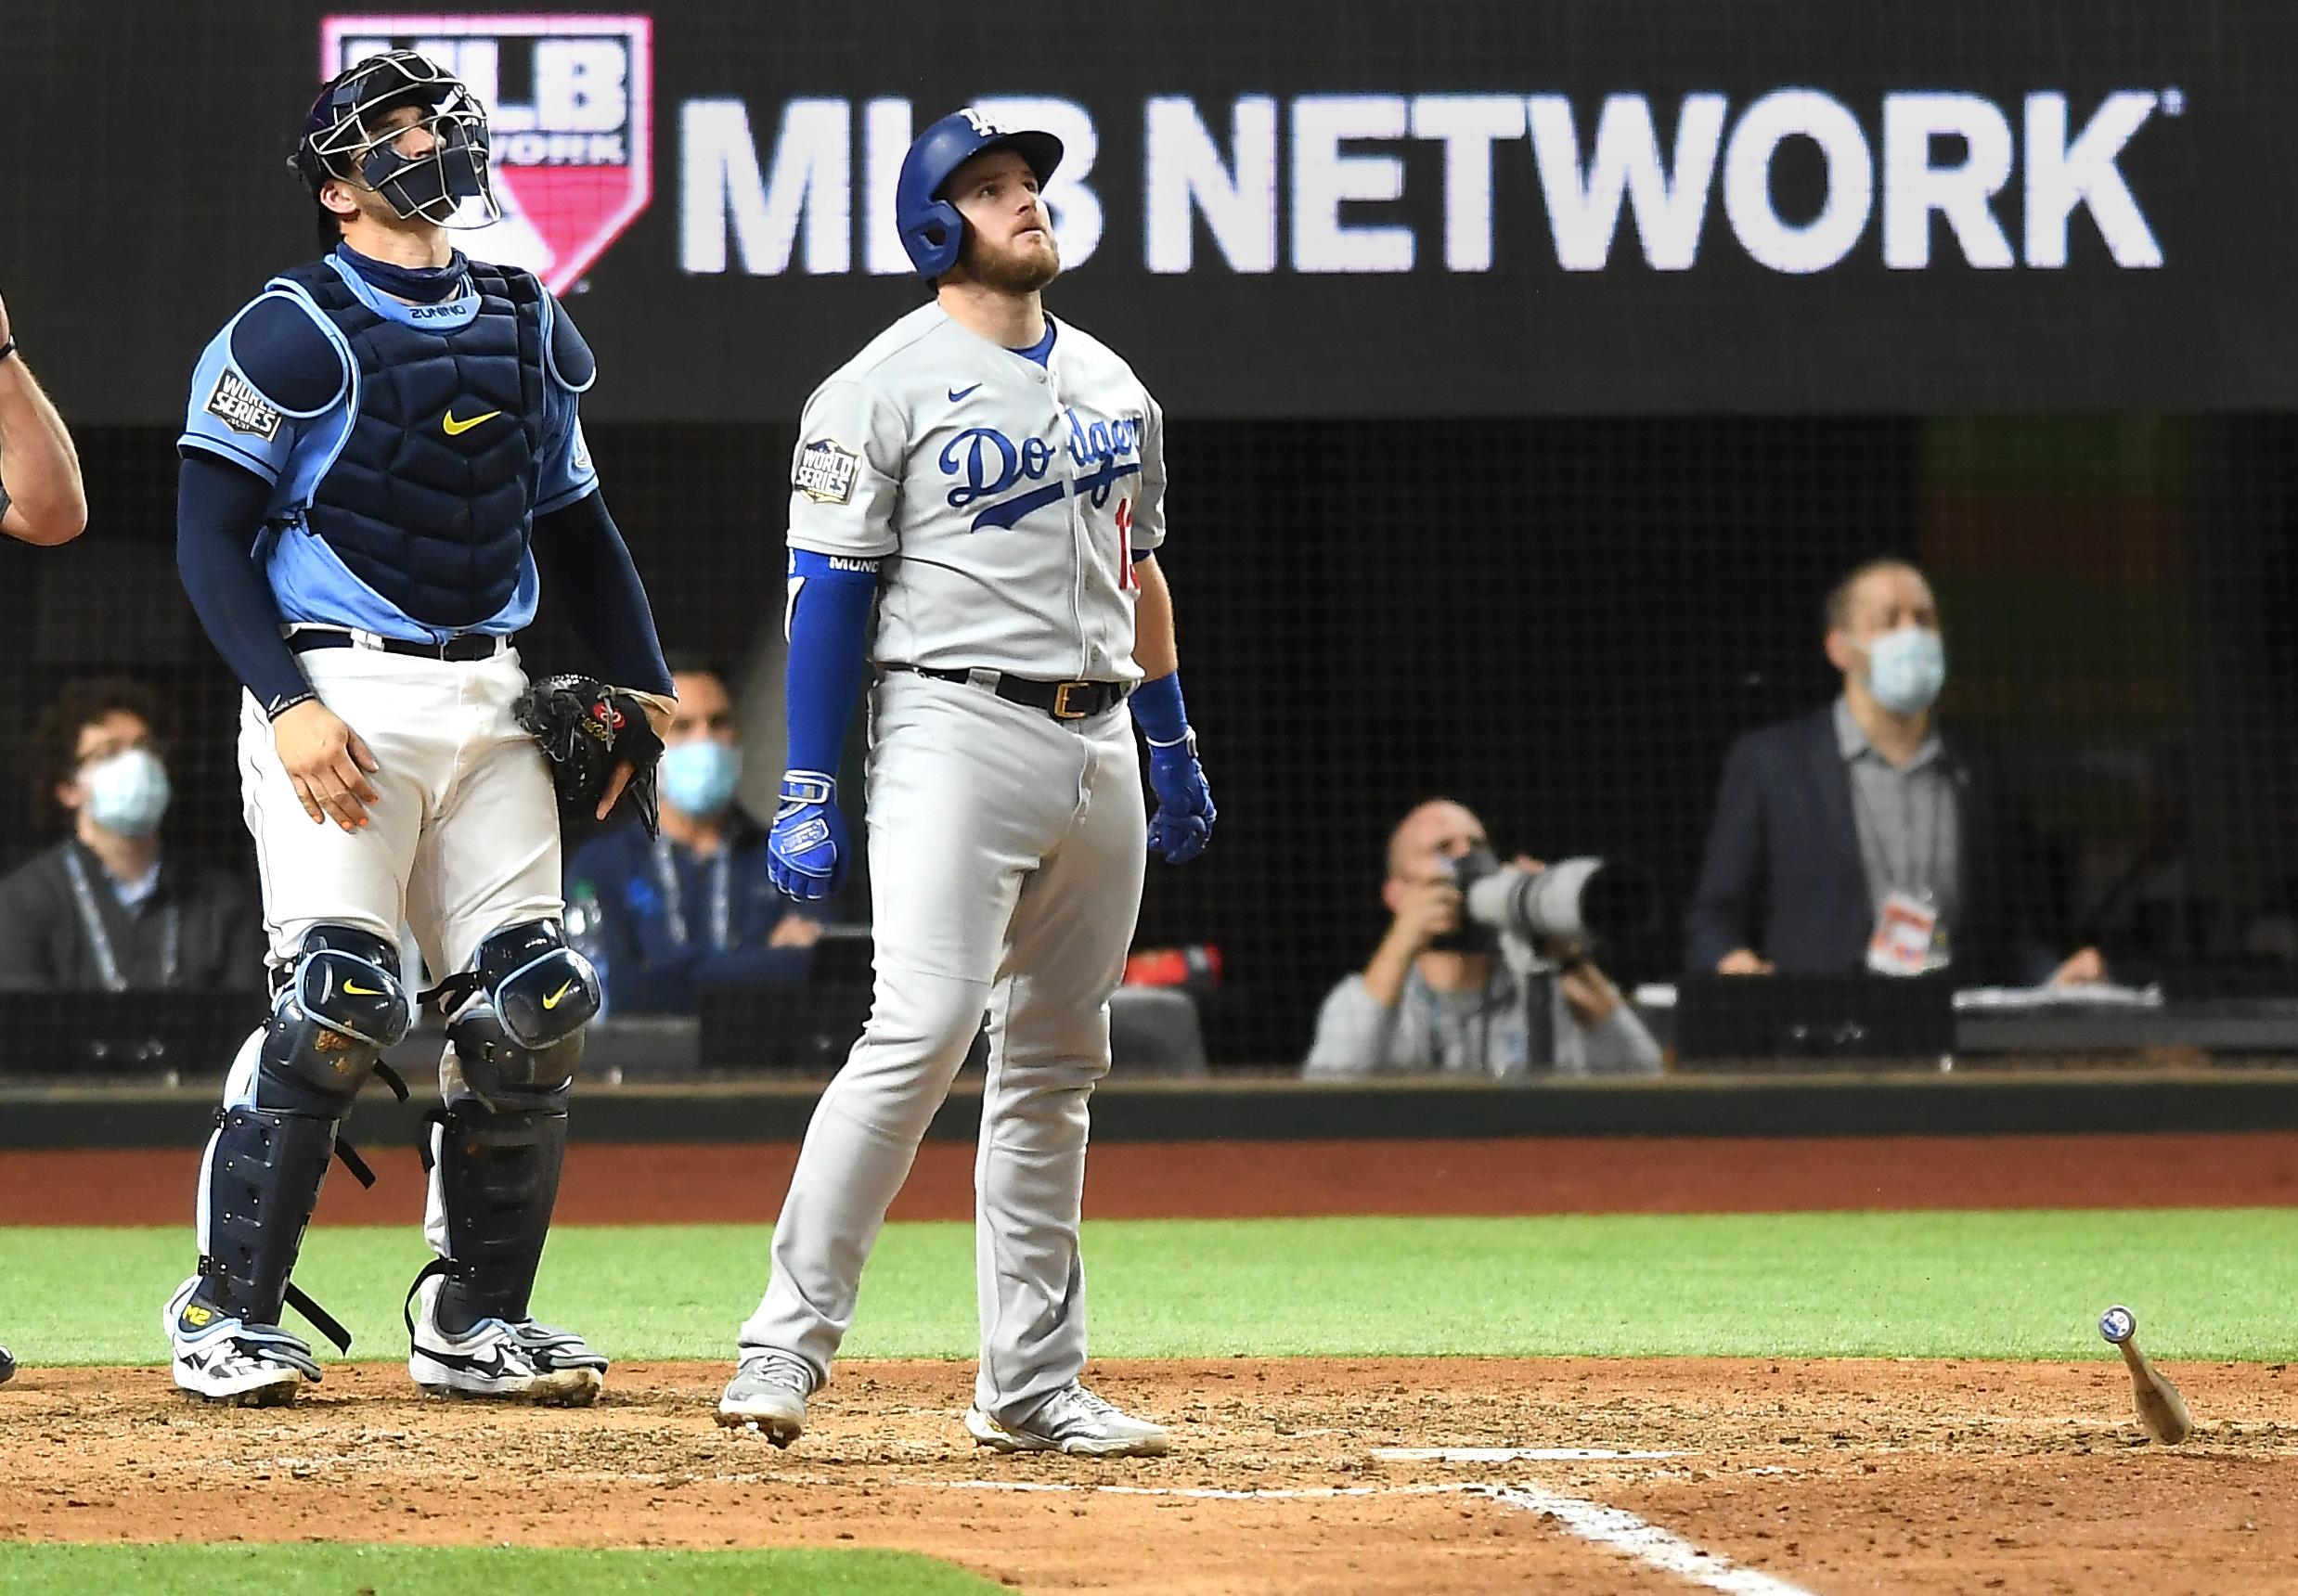 Dodgers v Rays - 2020 World Series